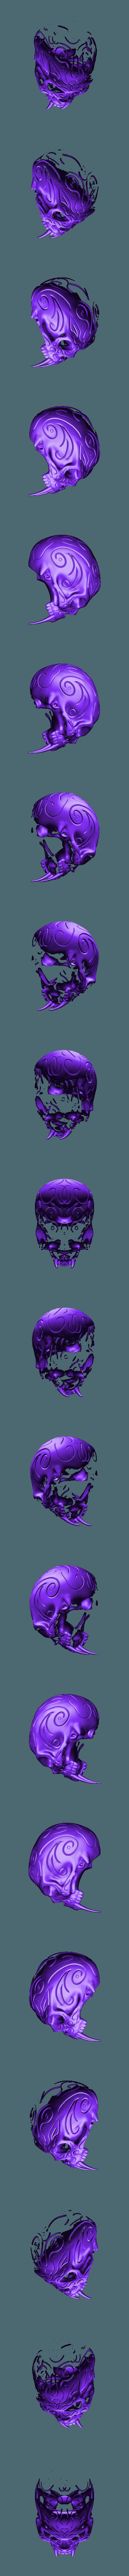 Sabre_skul__3d_print_model2.stl Download free STL file Tribal Sabre Tooth Skull • Model to 3D print, Taran3D